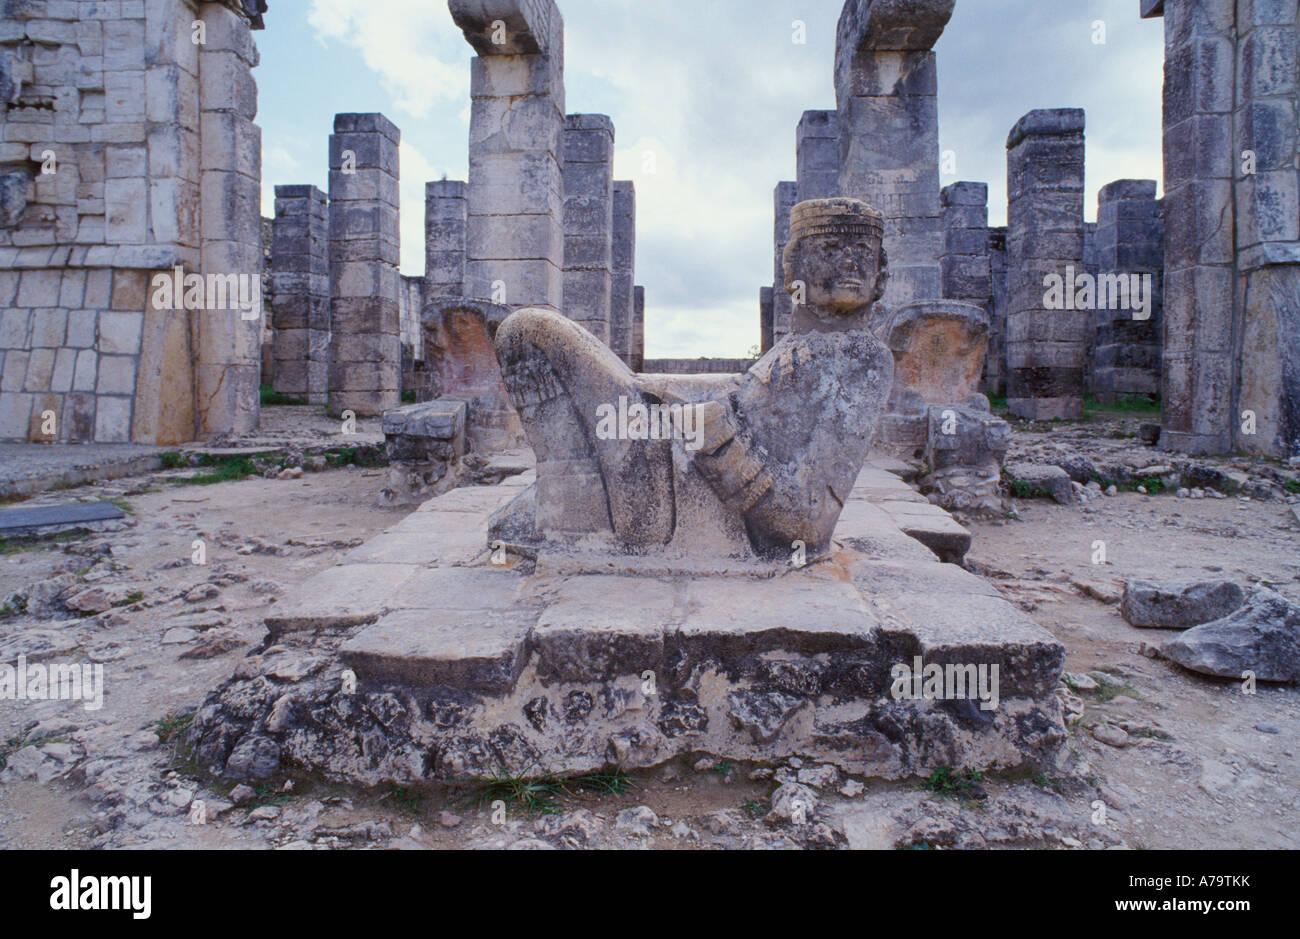 The Chac Mol a powerful symbol of the Mayan civilization. Maya Ruins at Chichen Itza, Mexico - Stock Image